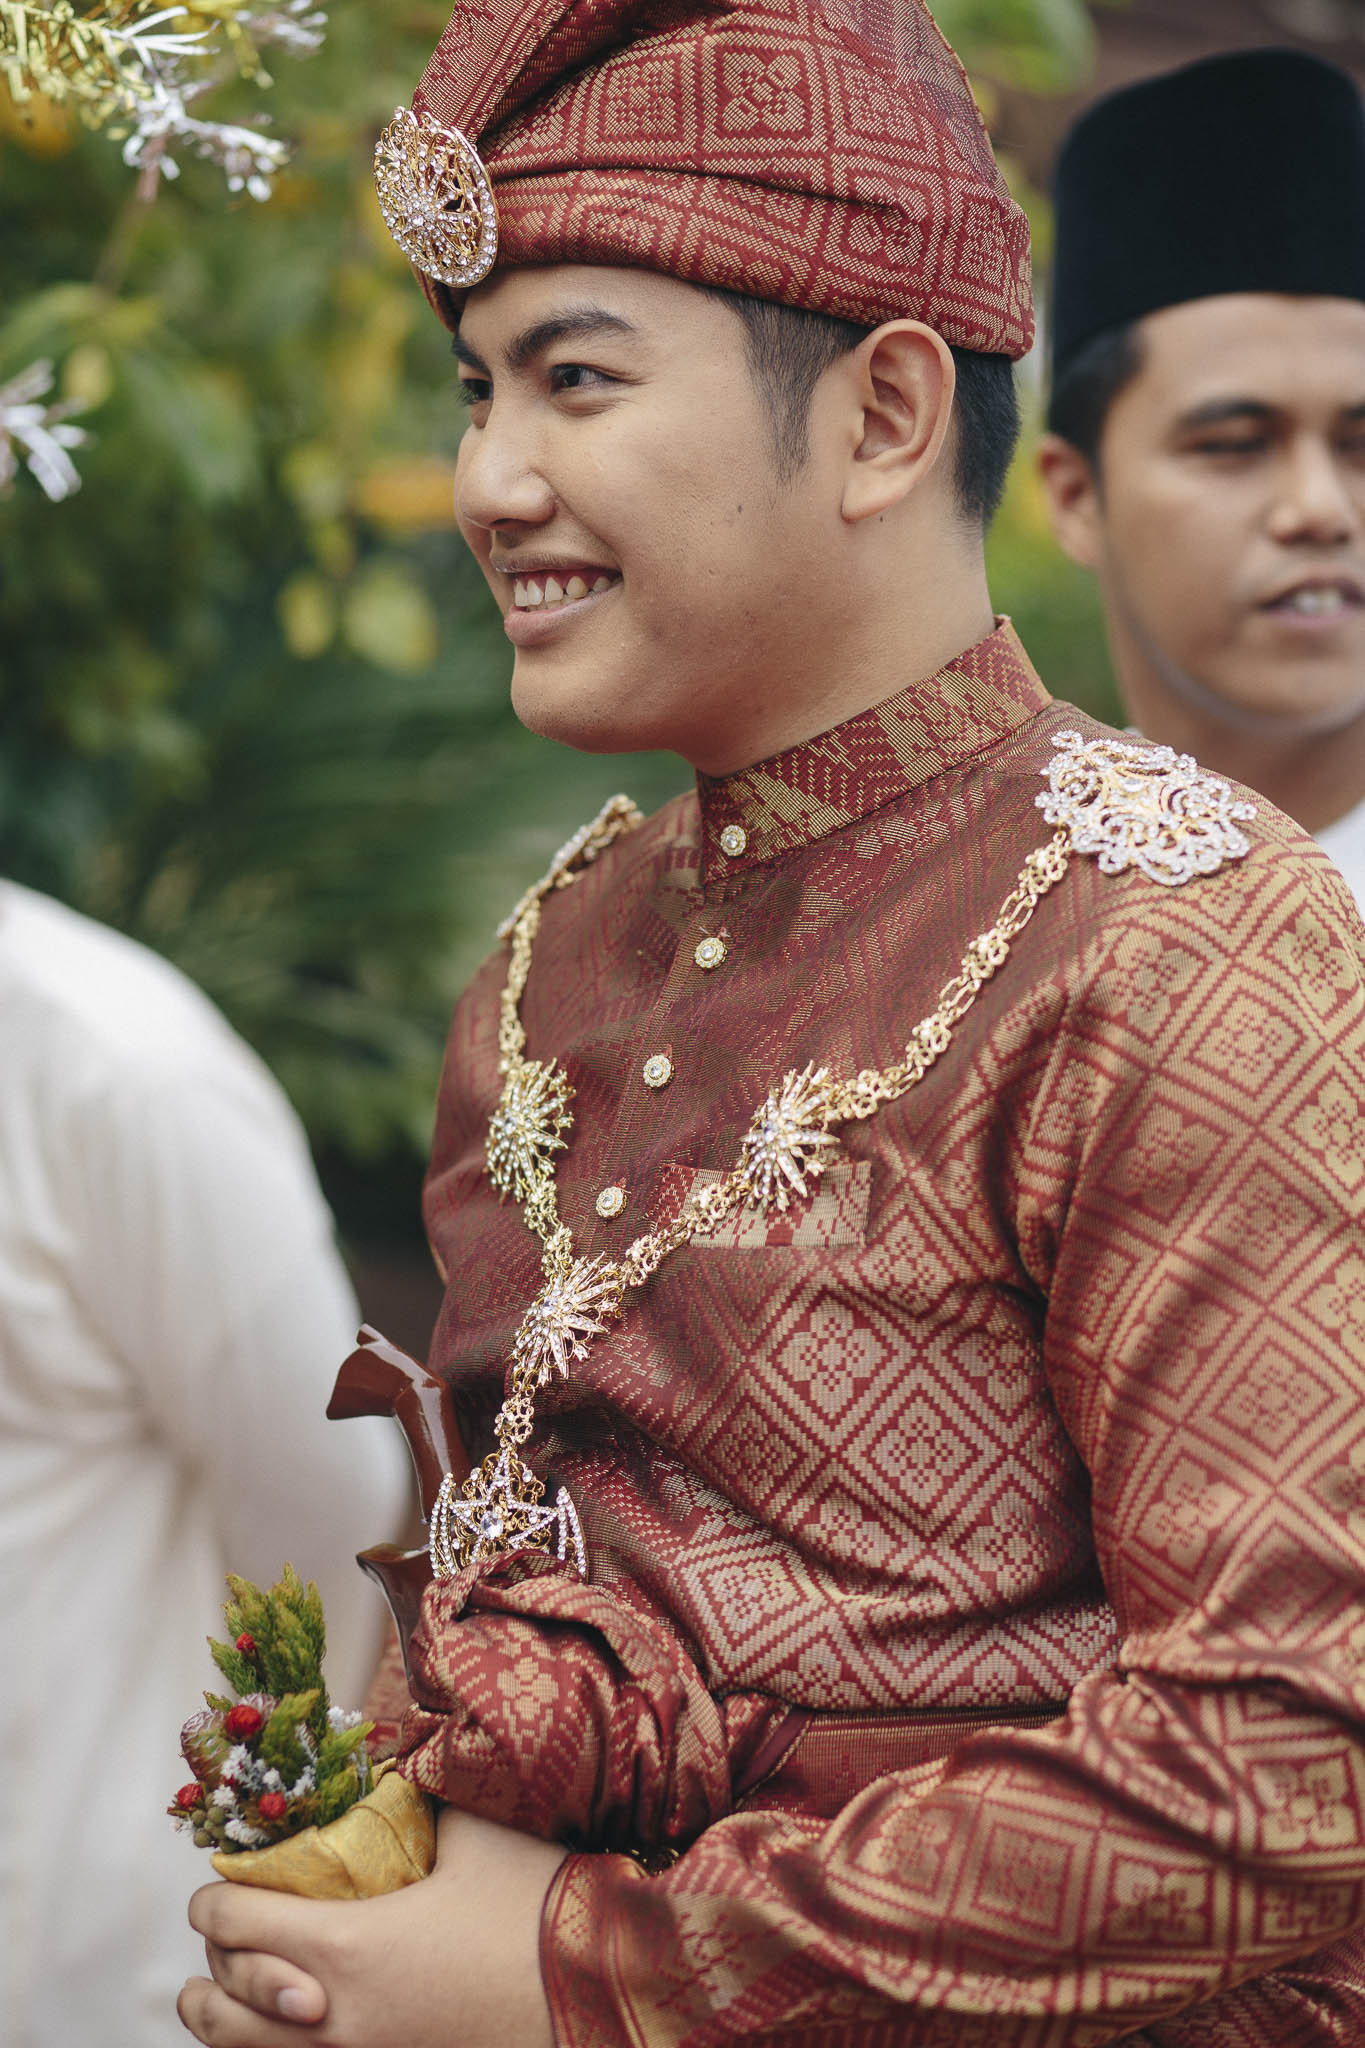 singapore-wedding-photographer-travel-khairul-atikah-44.jpg